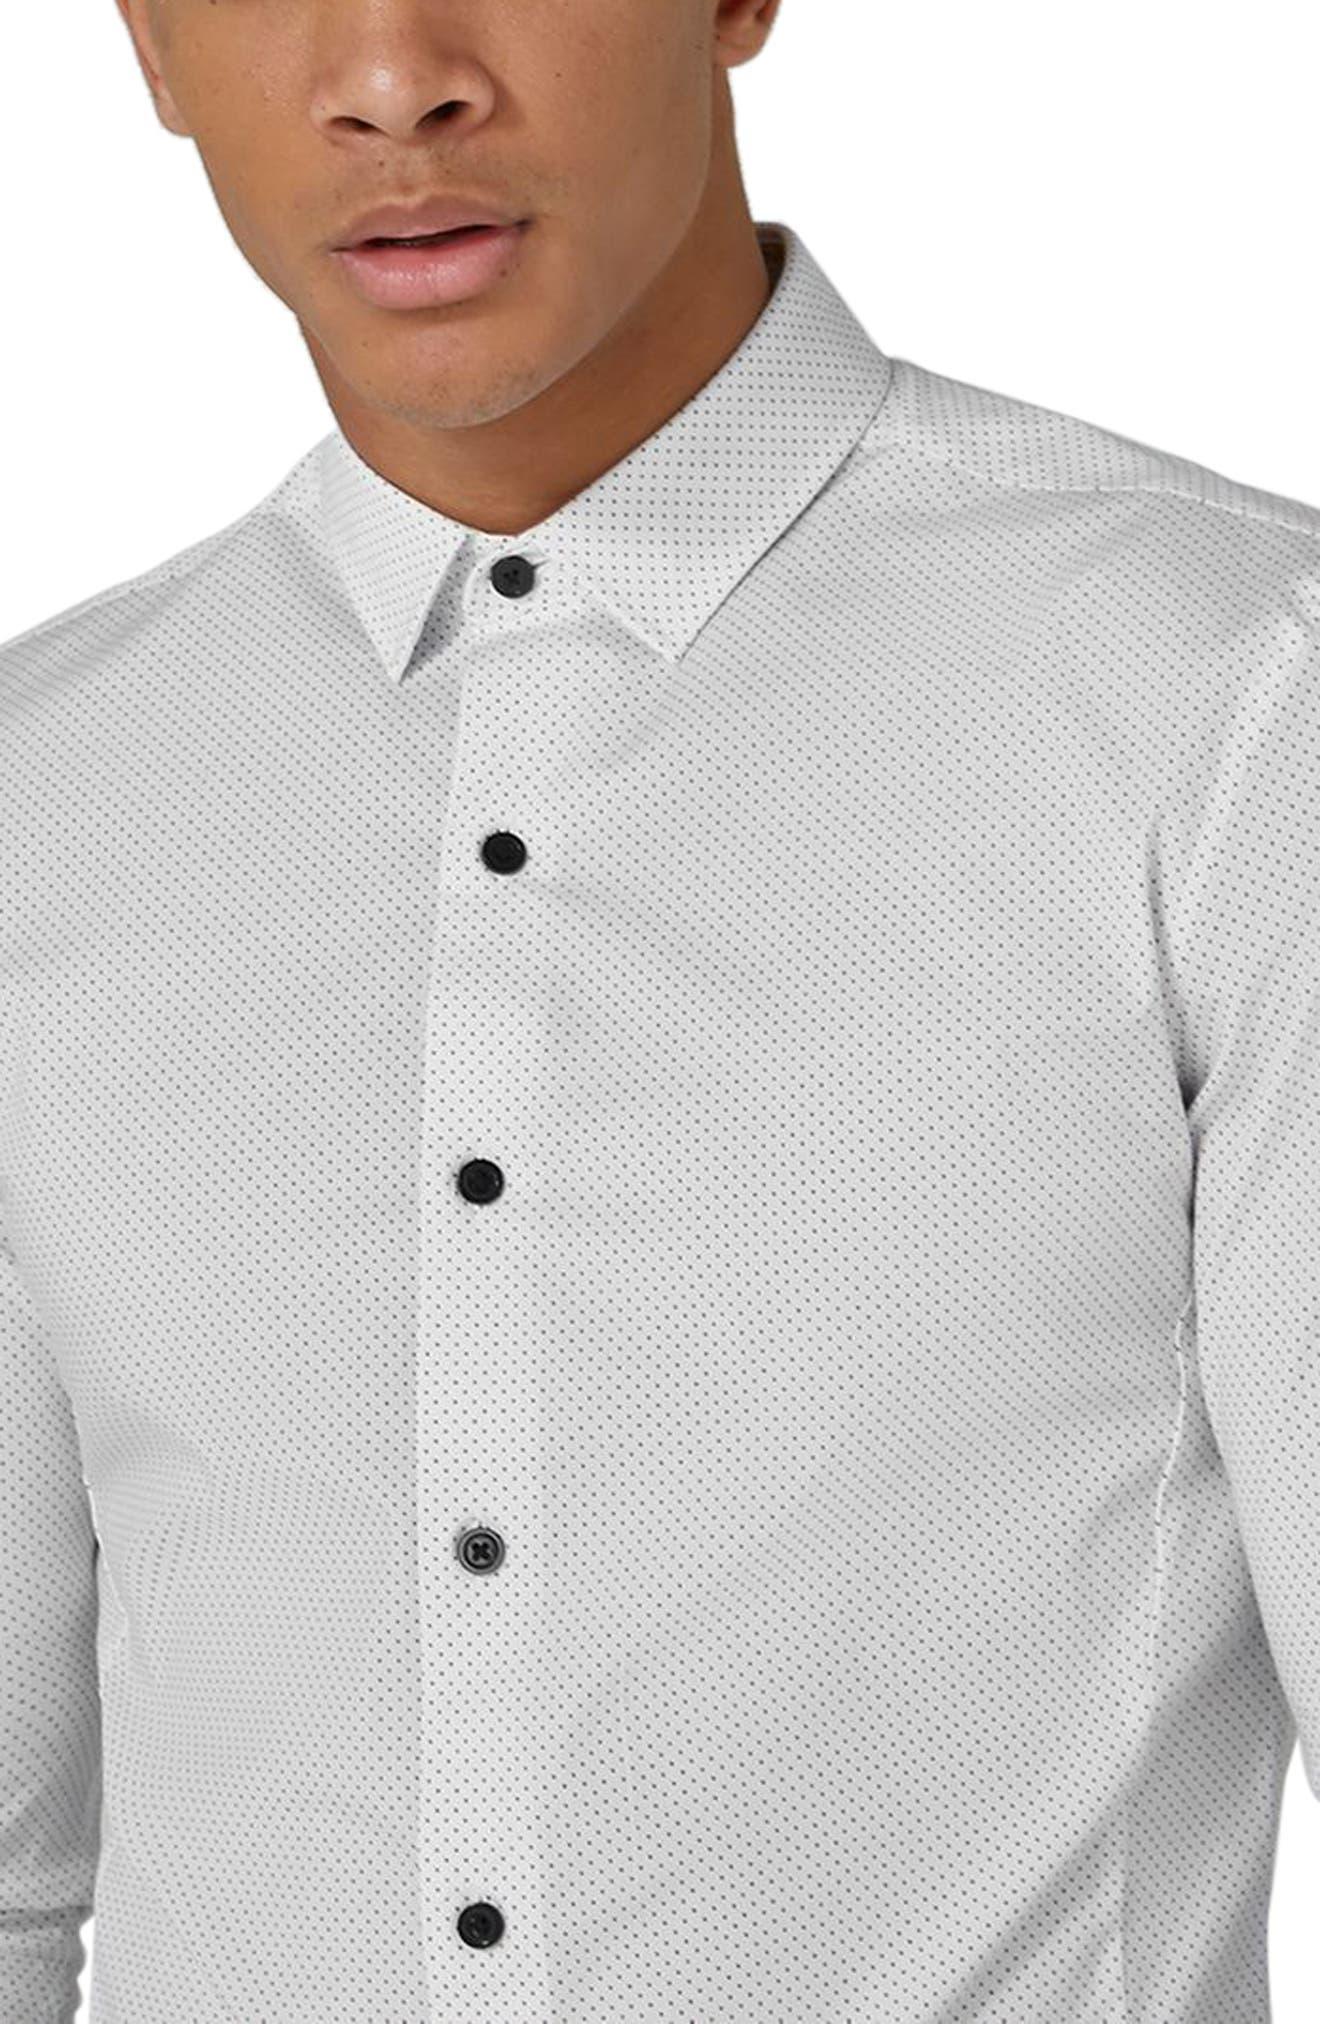 Muscle Fit Polka Dot Sport Shirt,                             Alternate thumbnail 3, color,                             White Multi